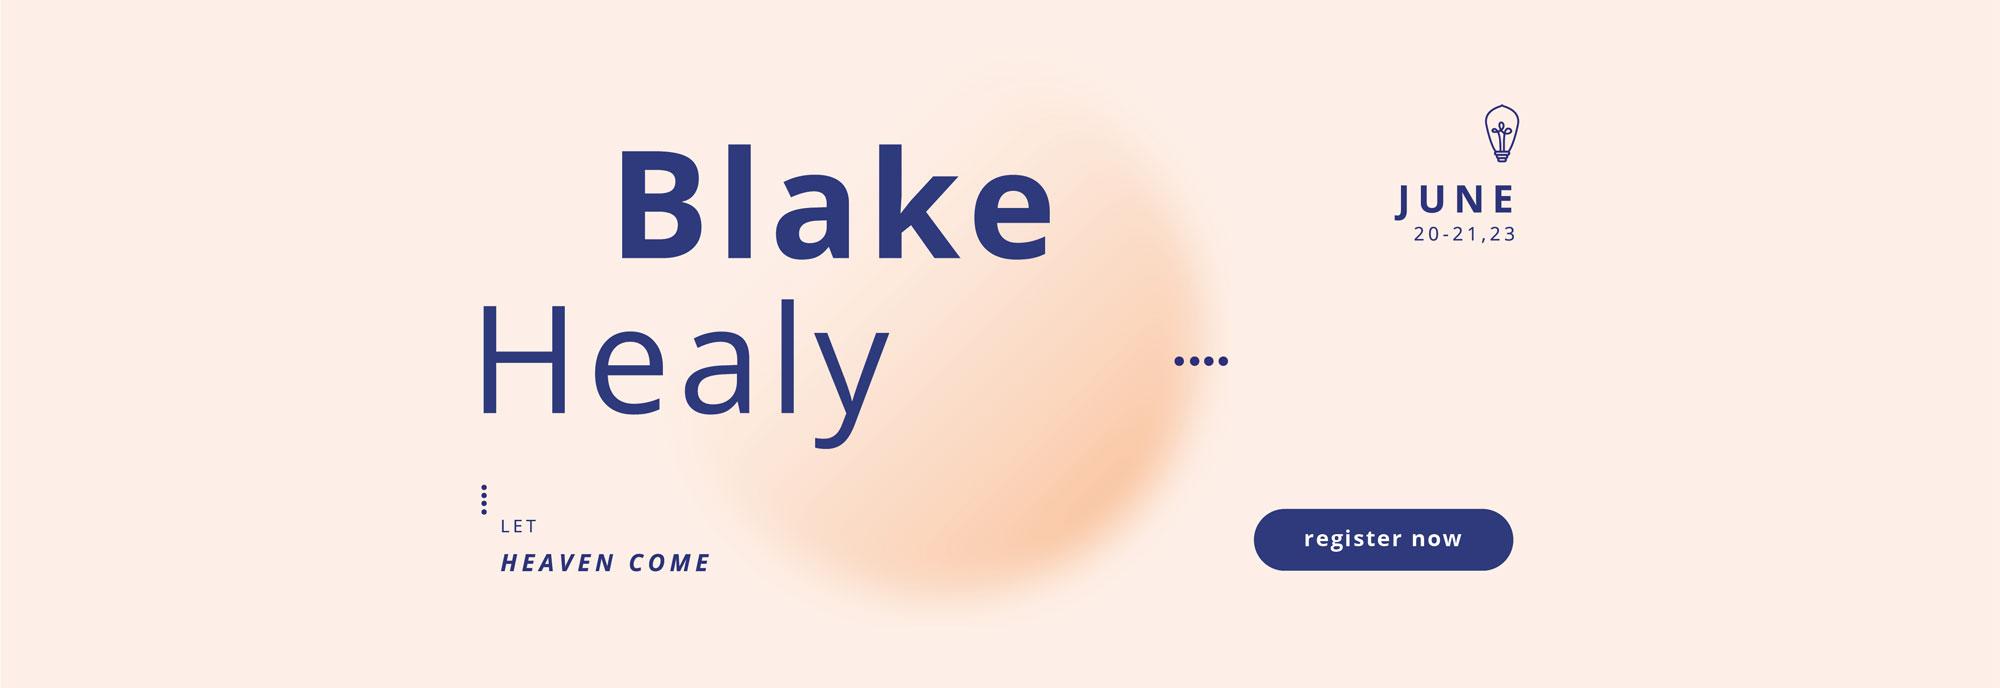 Light-city-blake-healy-banner